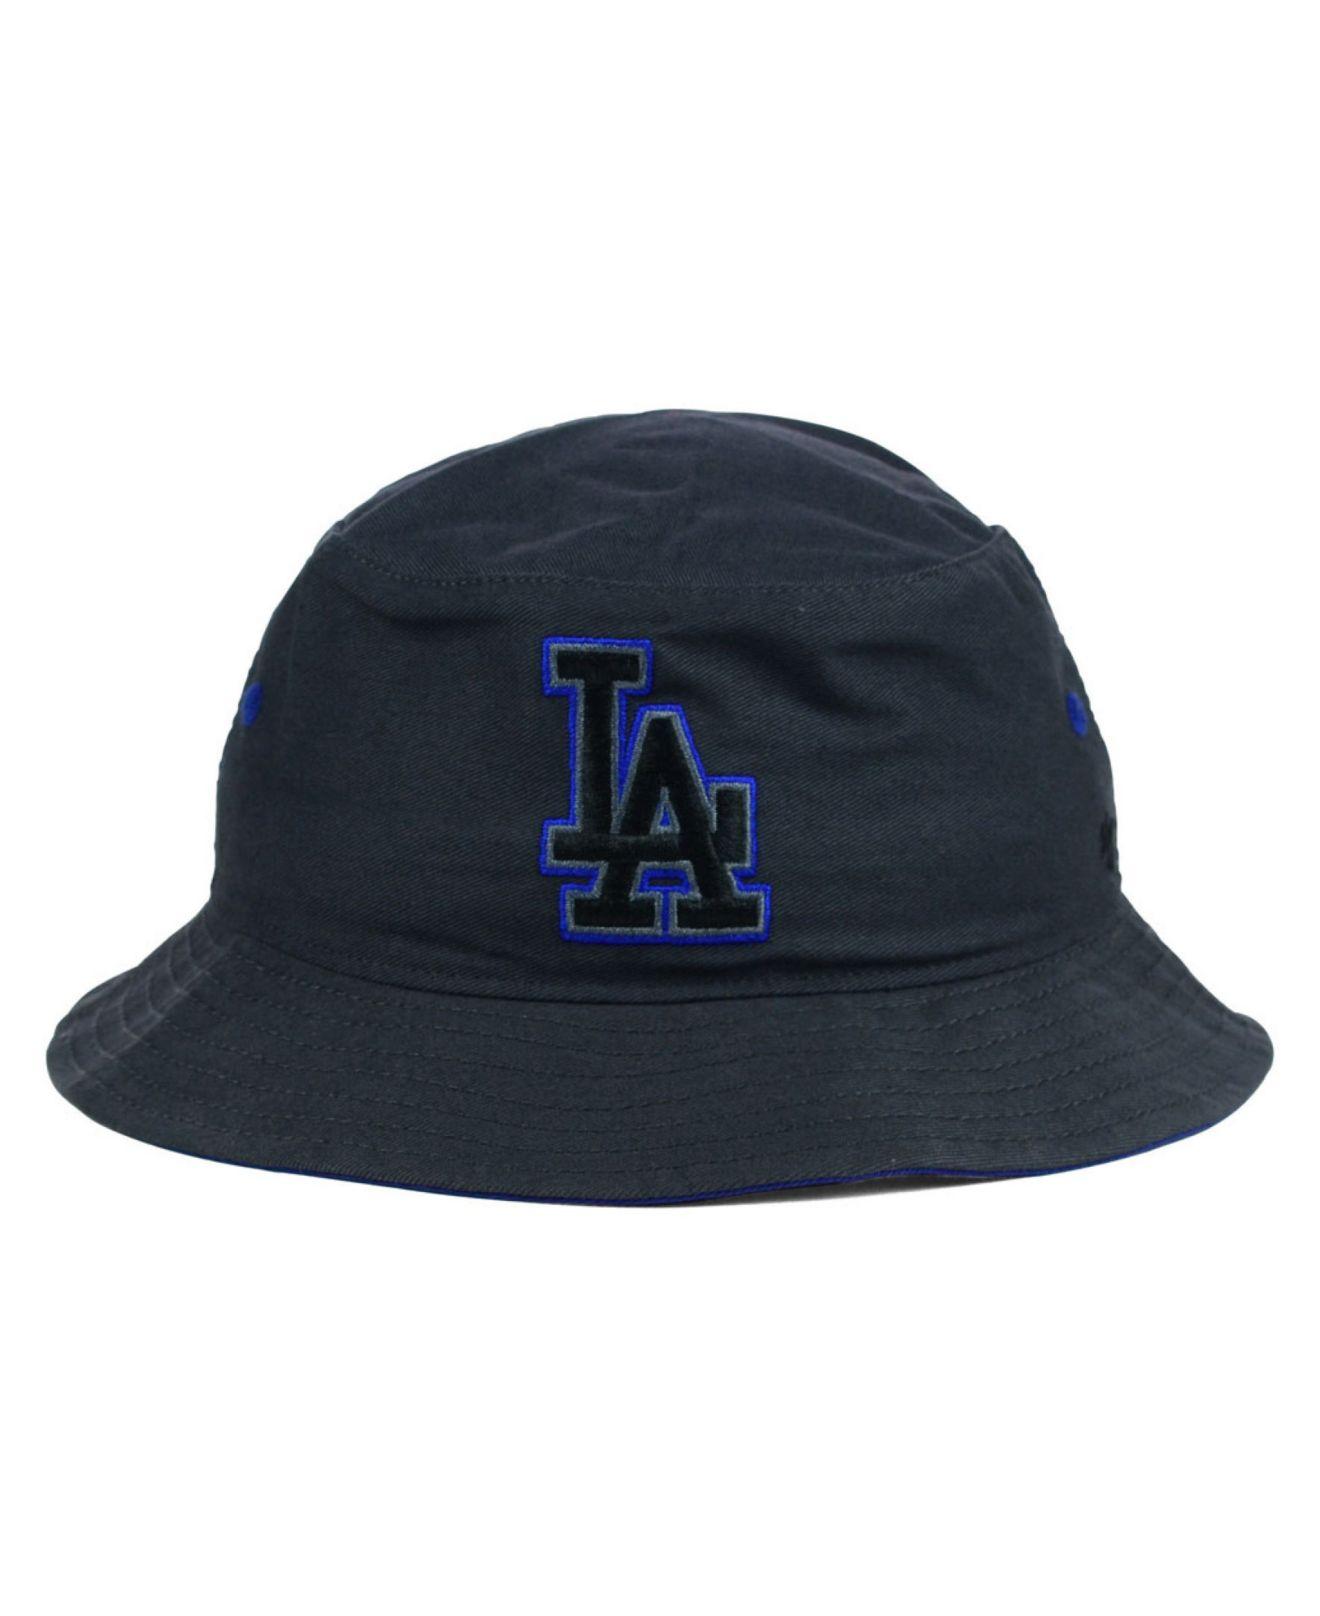 meet 0336c 927d3 Lyst - 47 Brand Los Angeles Dodgers Turbo Bucket Hat in Gray